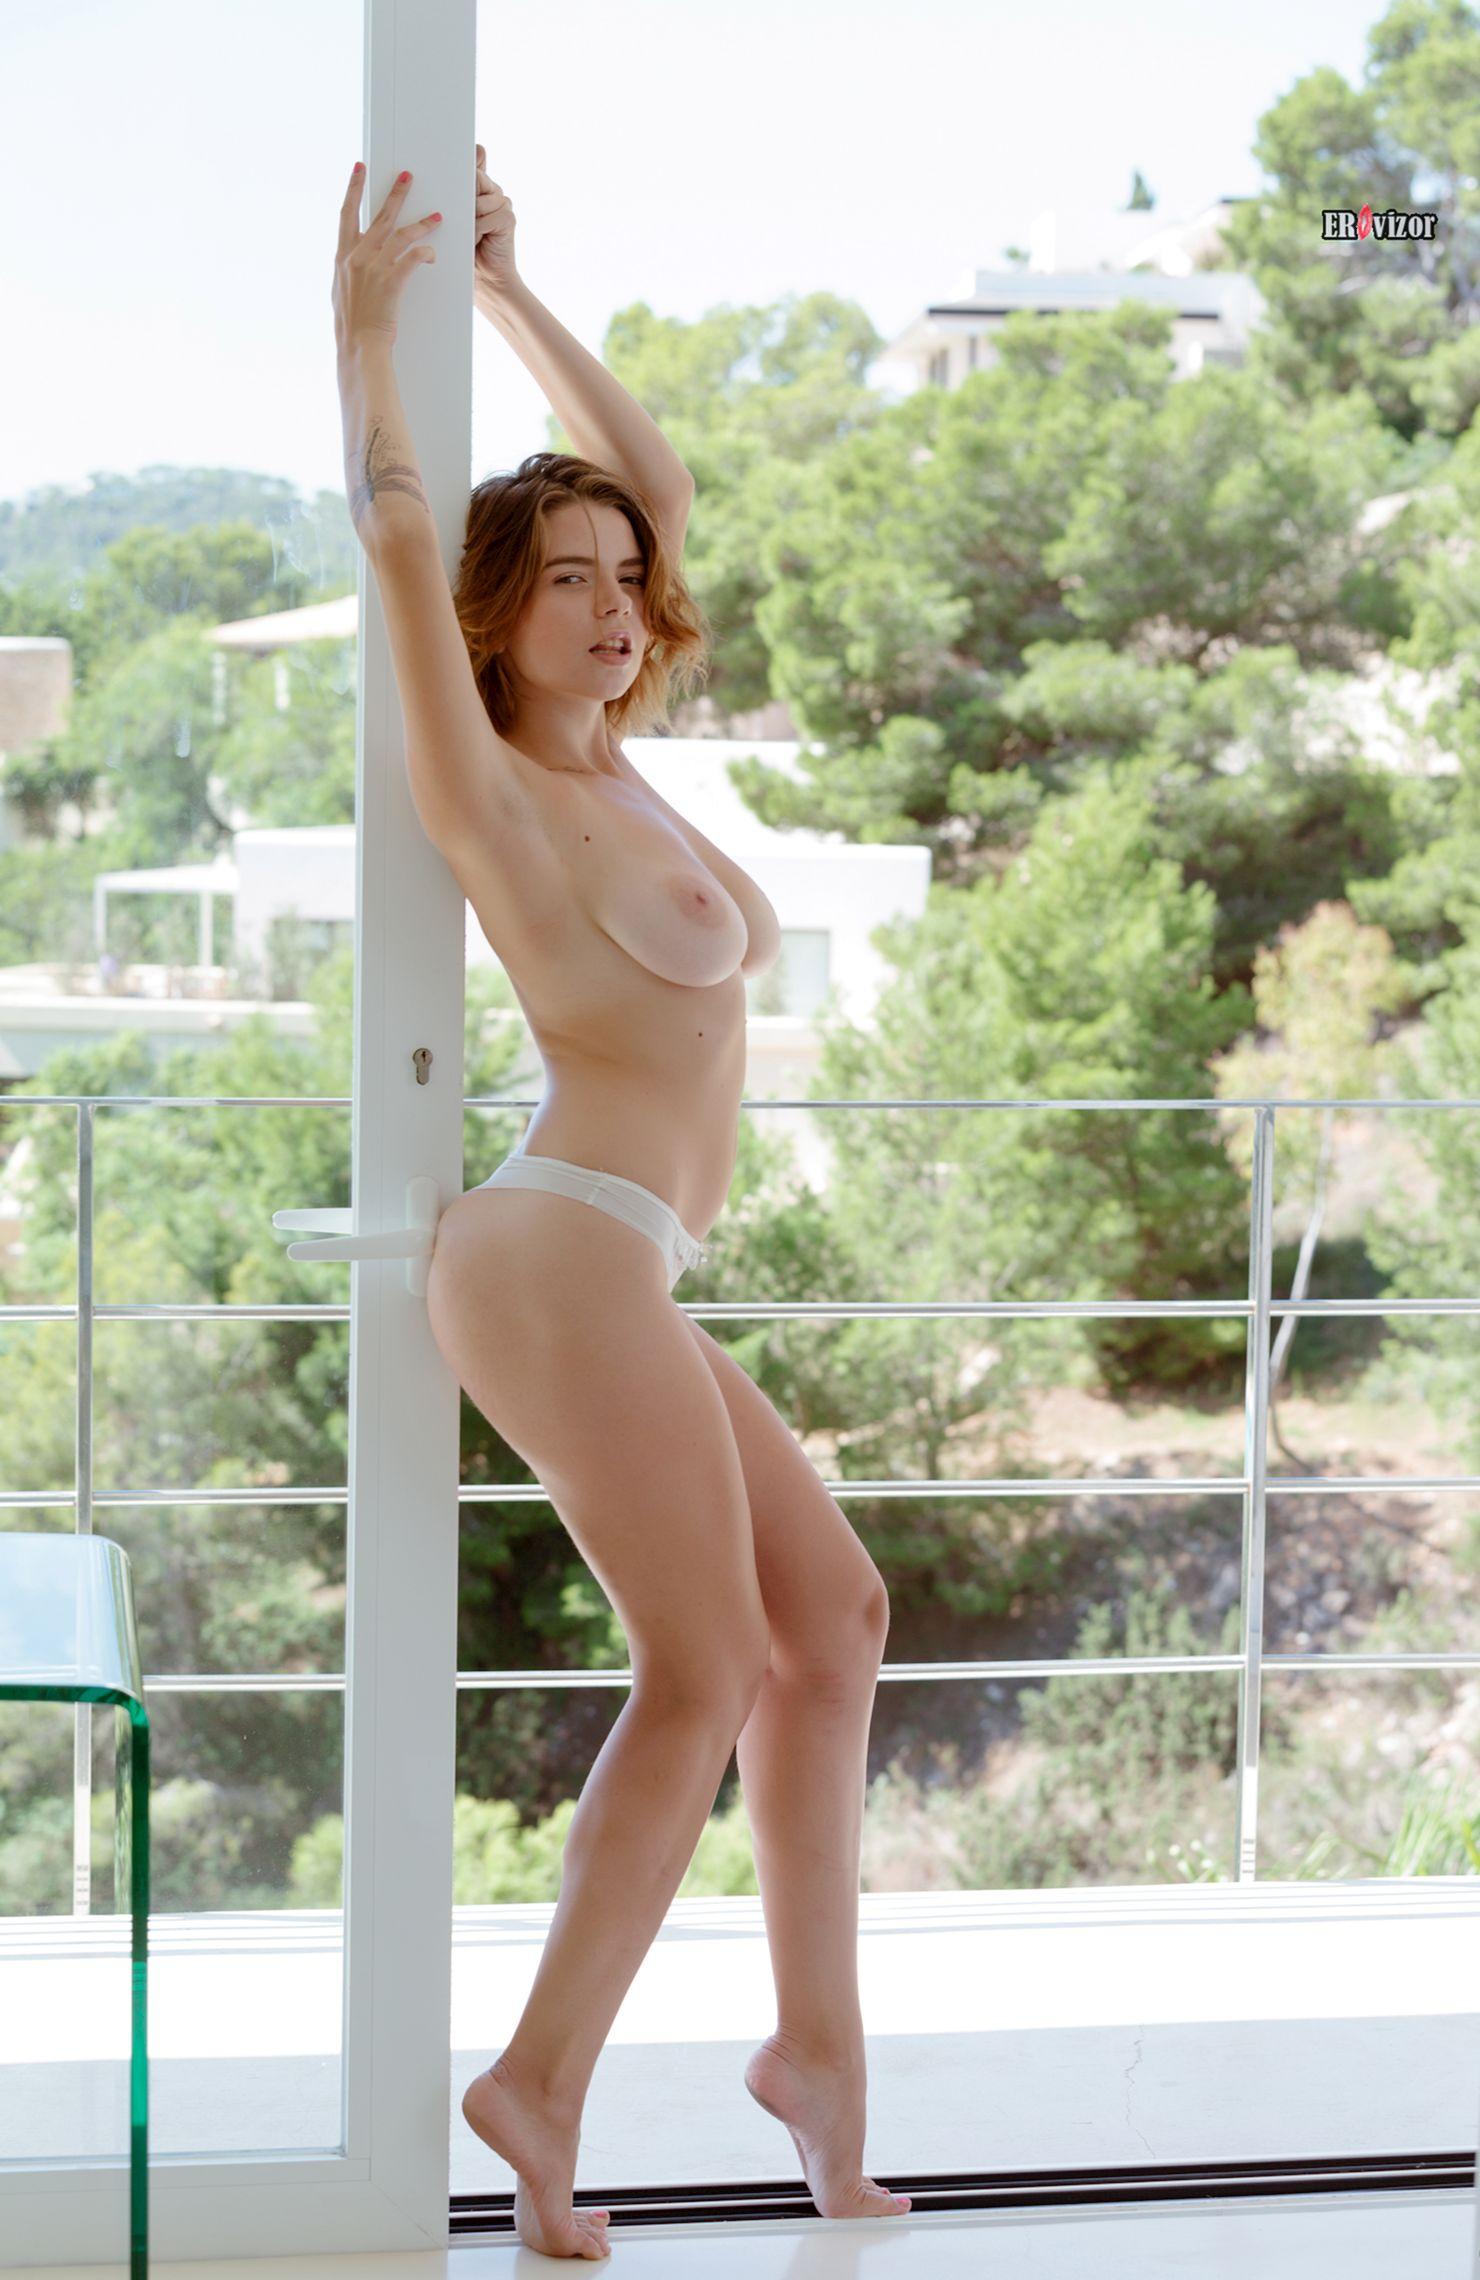 Mariana-Visconti-with-Big-Naturals tits (8)